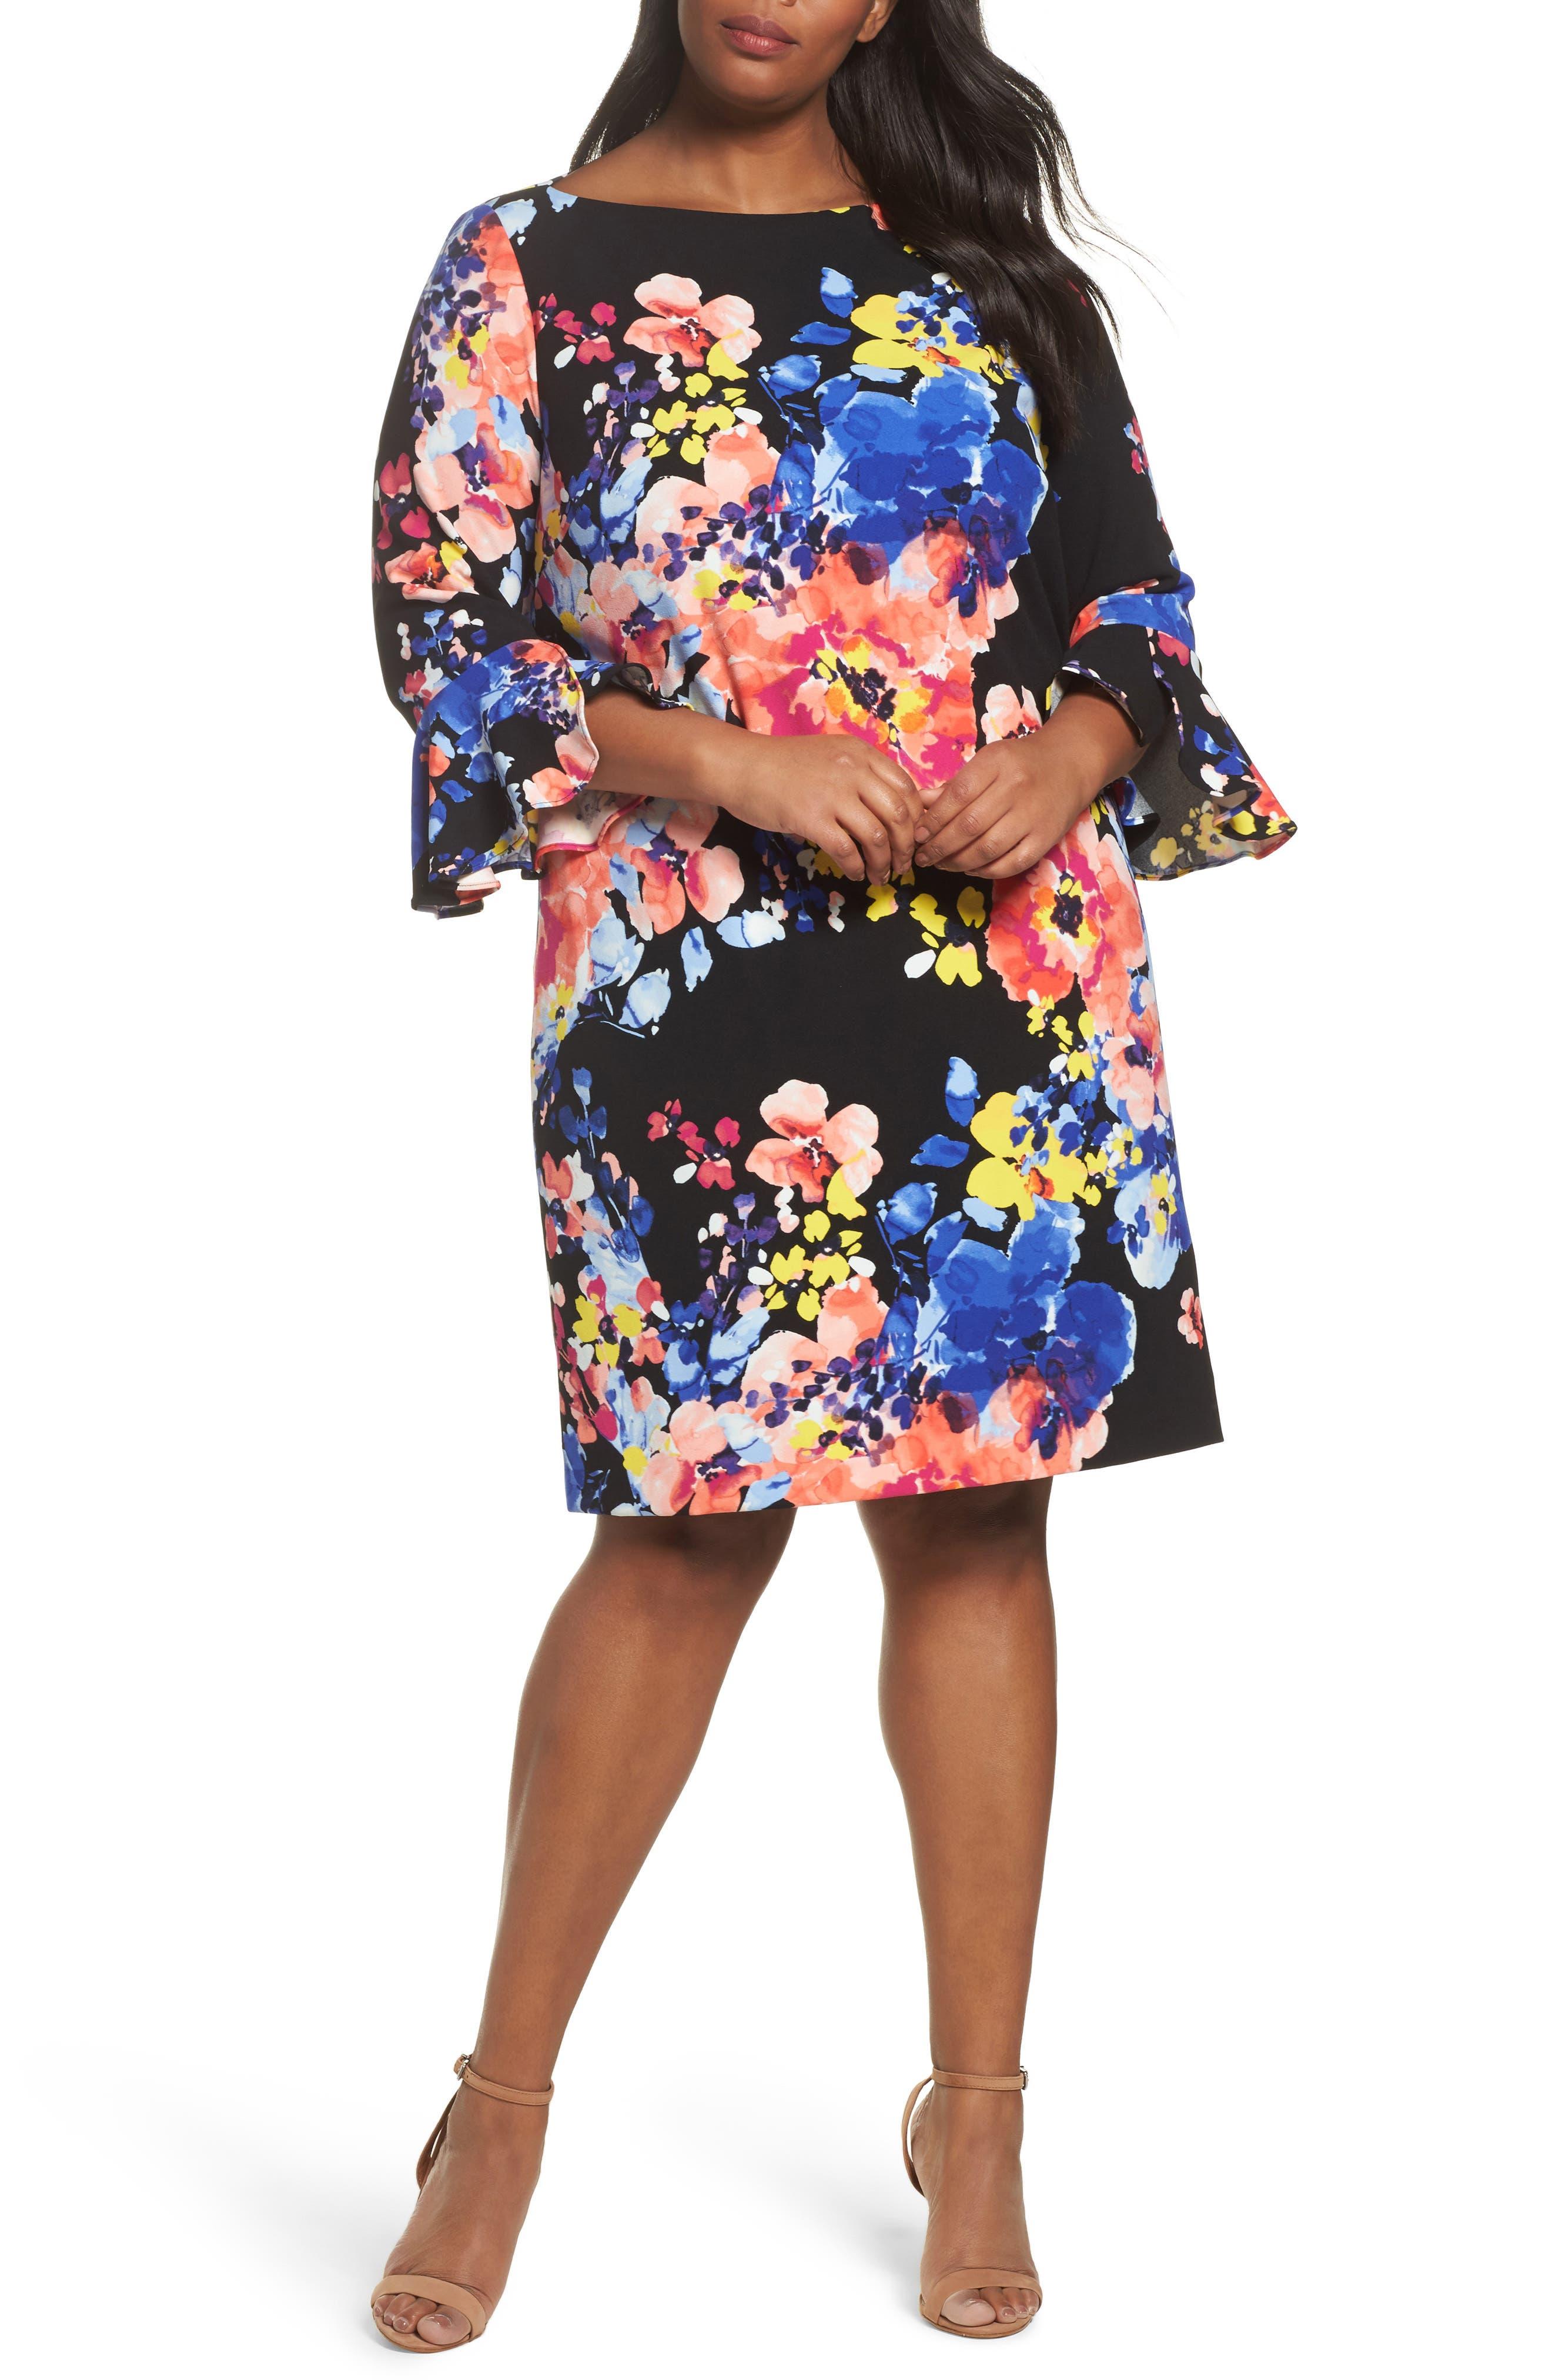 Alternate Image 1 Selected - Tahari Print Ruffle Sleeve Shift Dress (Plus Size)